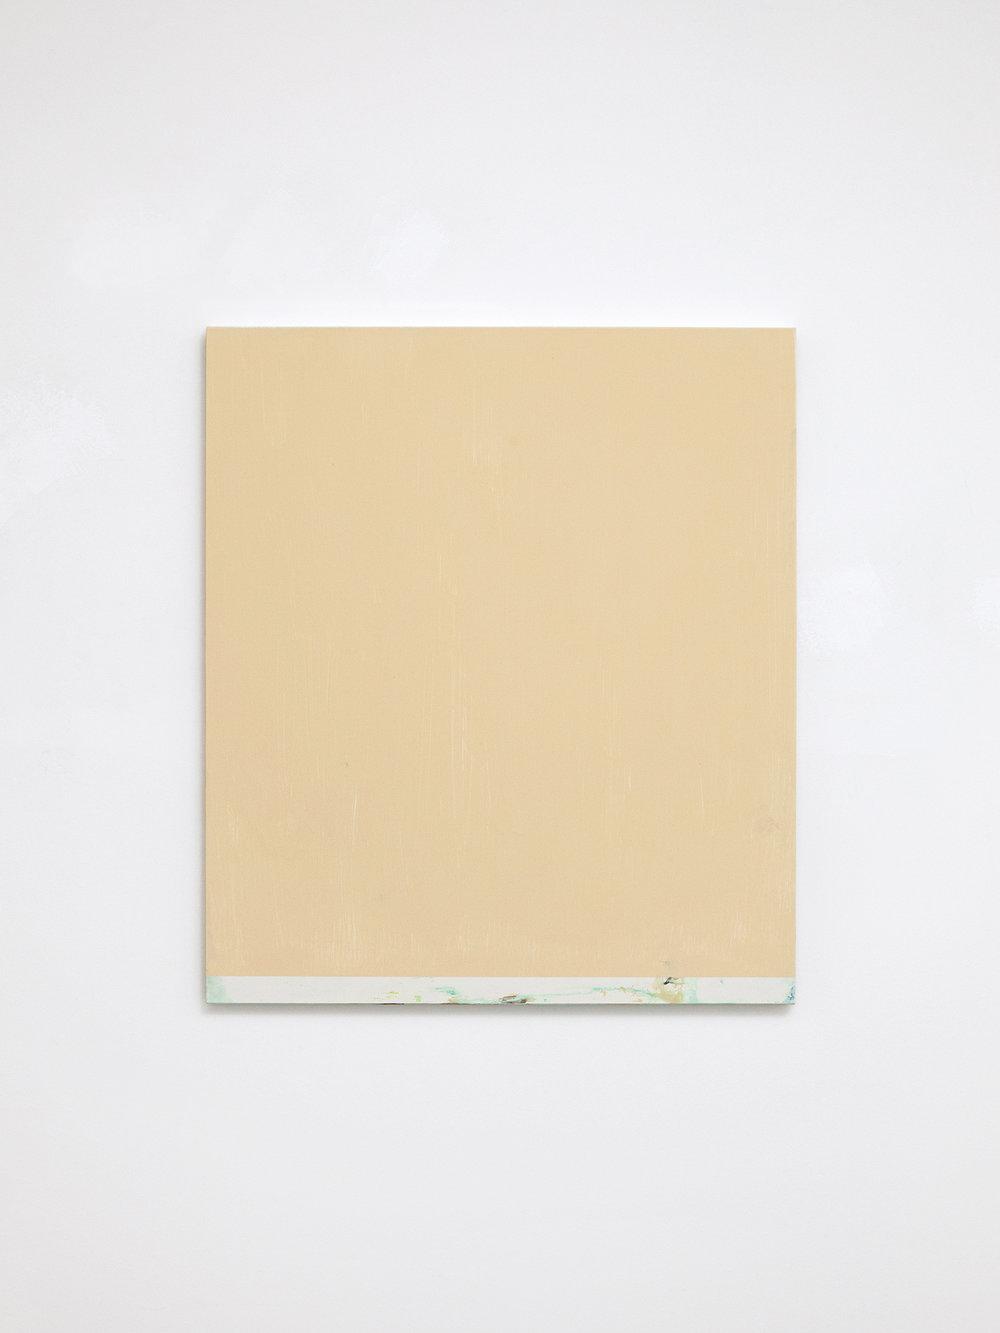 Untitled, 2018 Matt emulsion, acrylic and pigment on laminated chipboard  38 x 33 cm